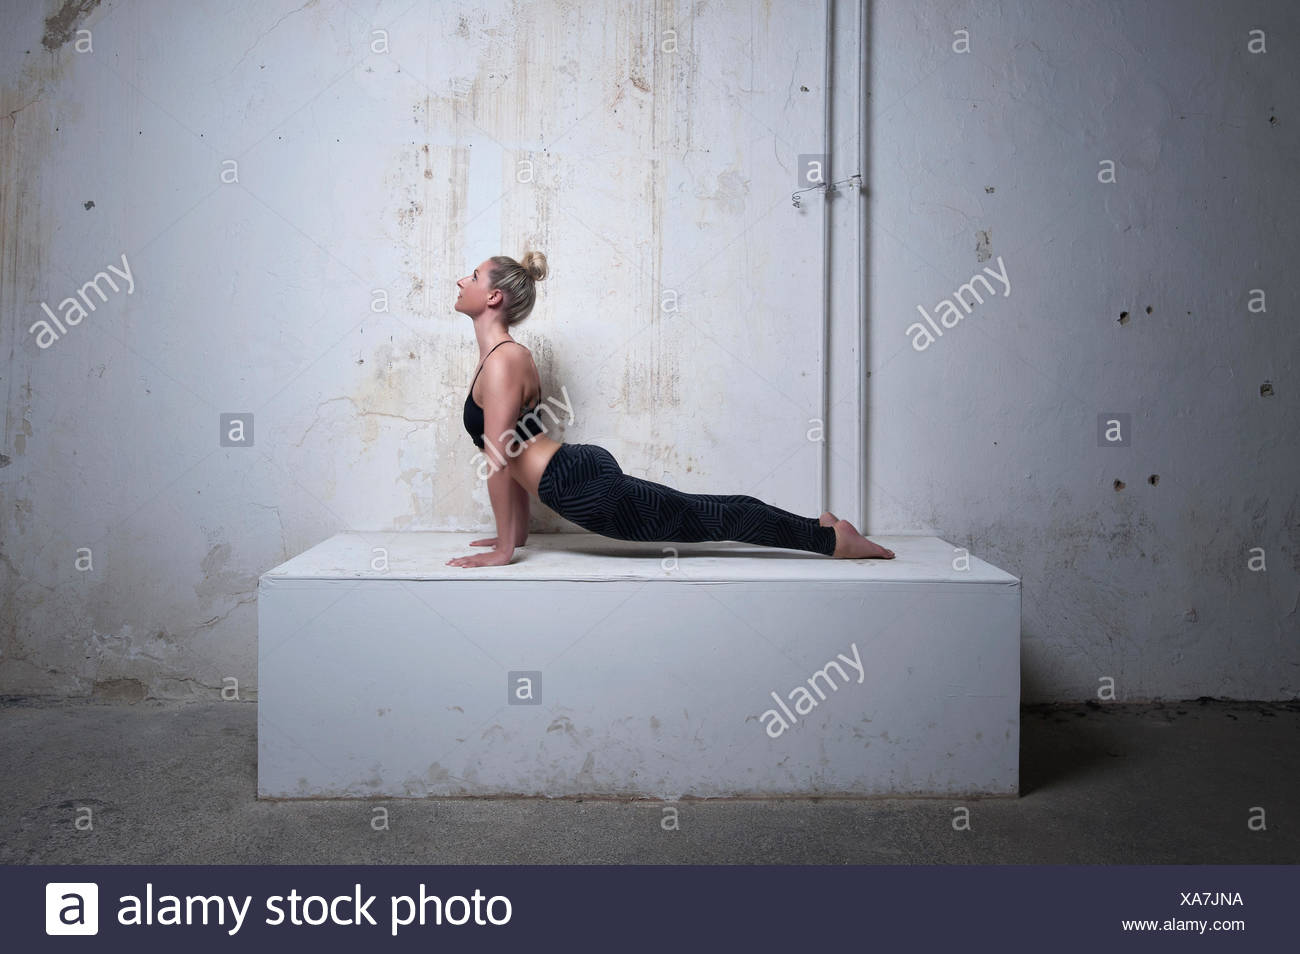 Mid adult woman practicing upward facing dog position on concrete block, Munich, Bavaria, Germany - Stock Image